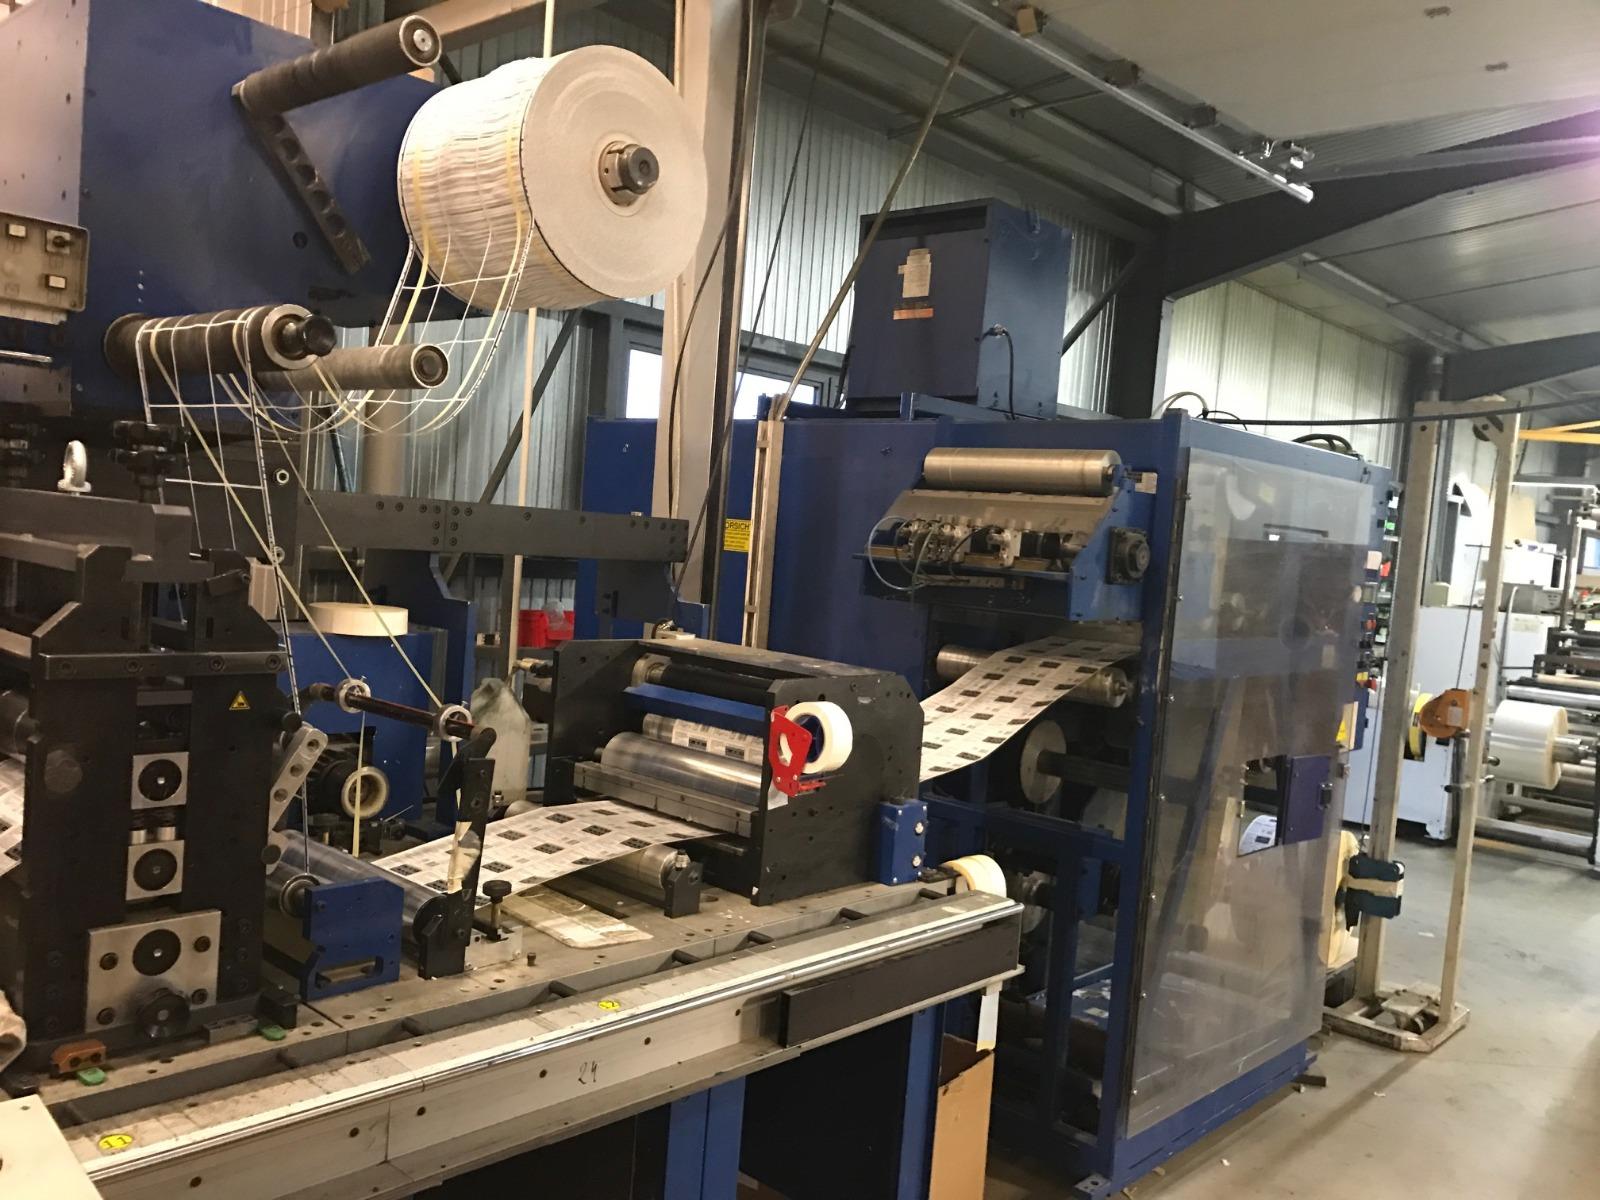 Gallus EM410 - Used Flexo Printing Presses and Used Flexographic Equipment-8